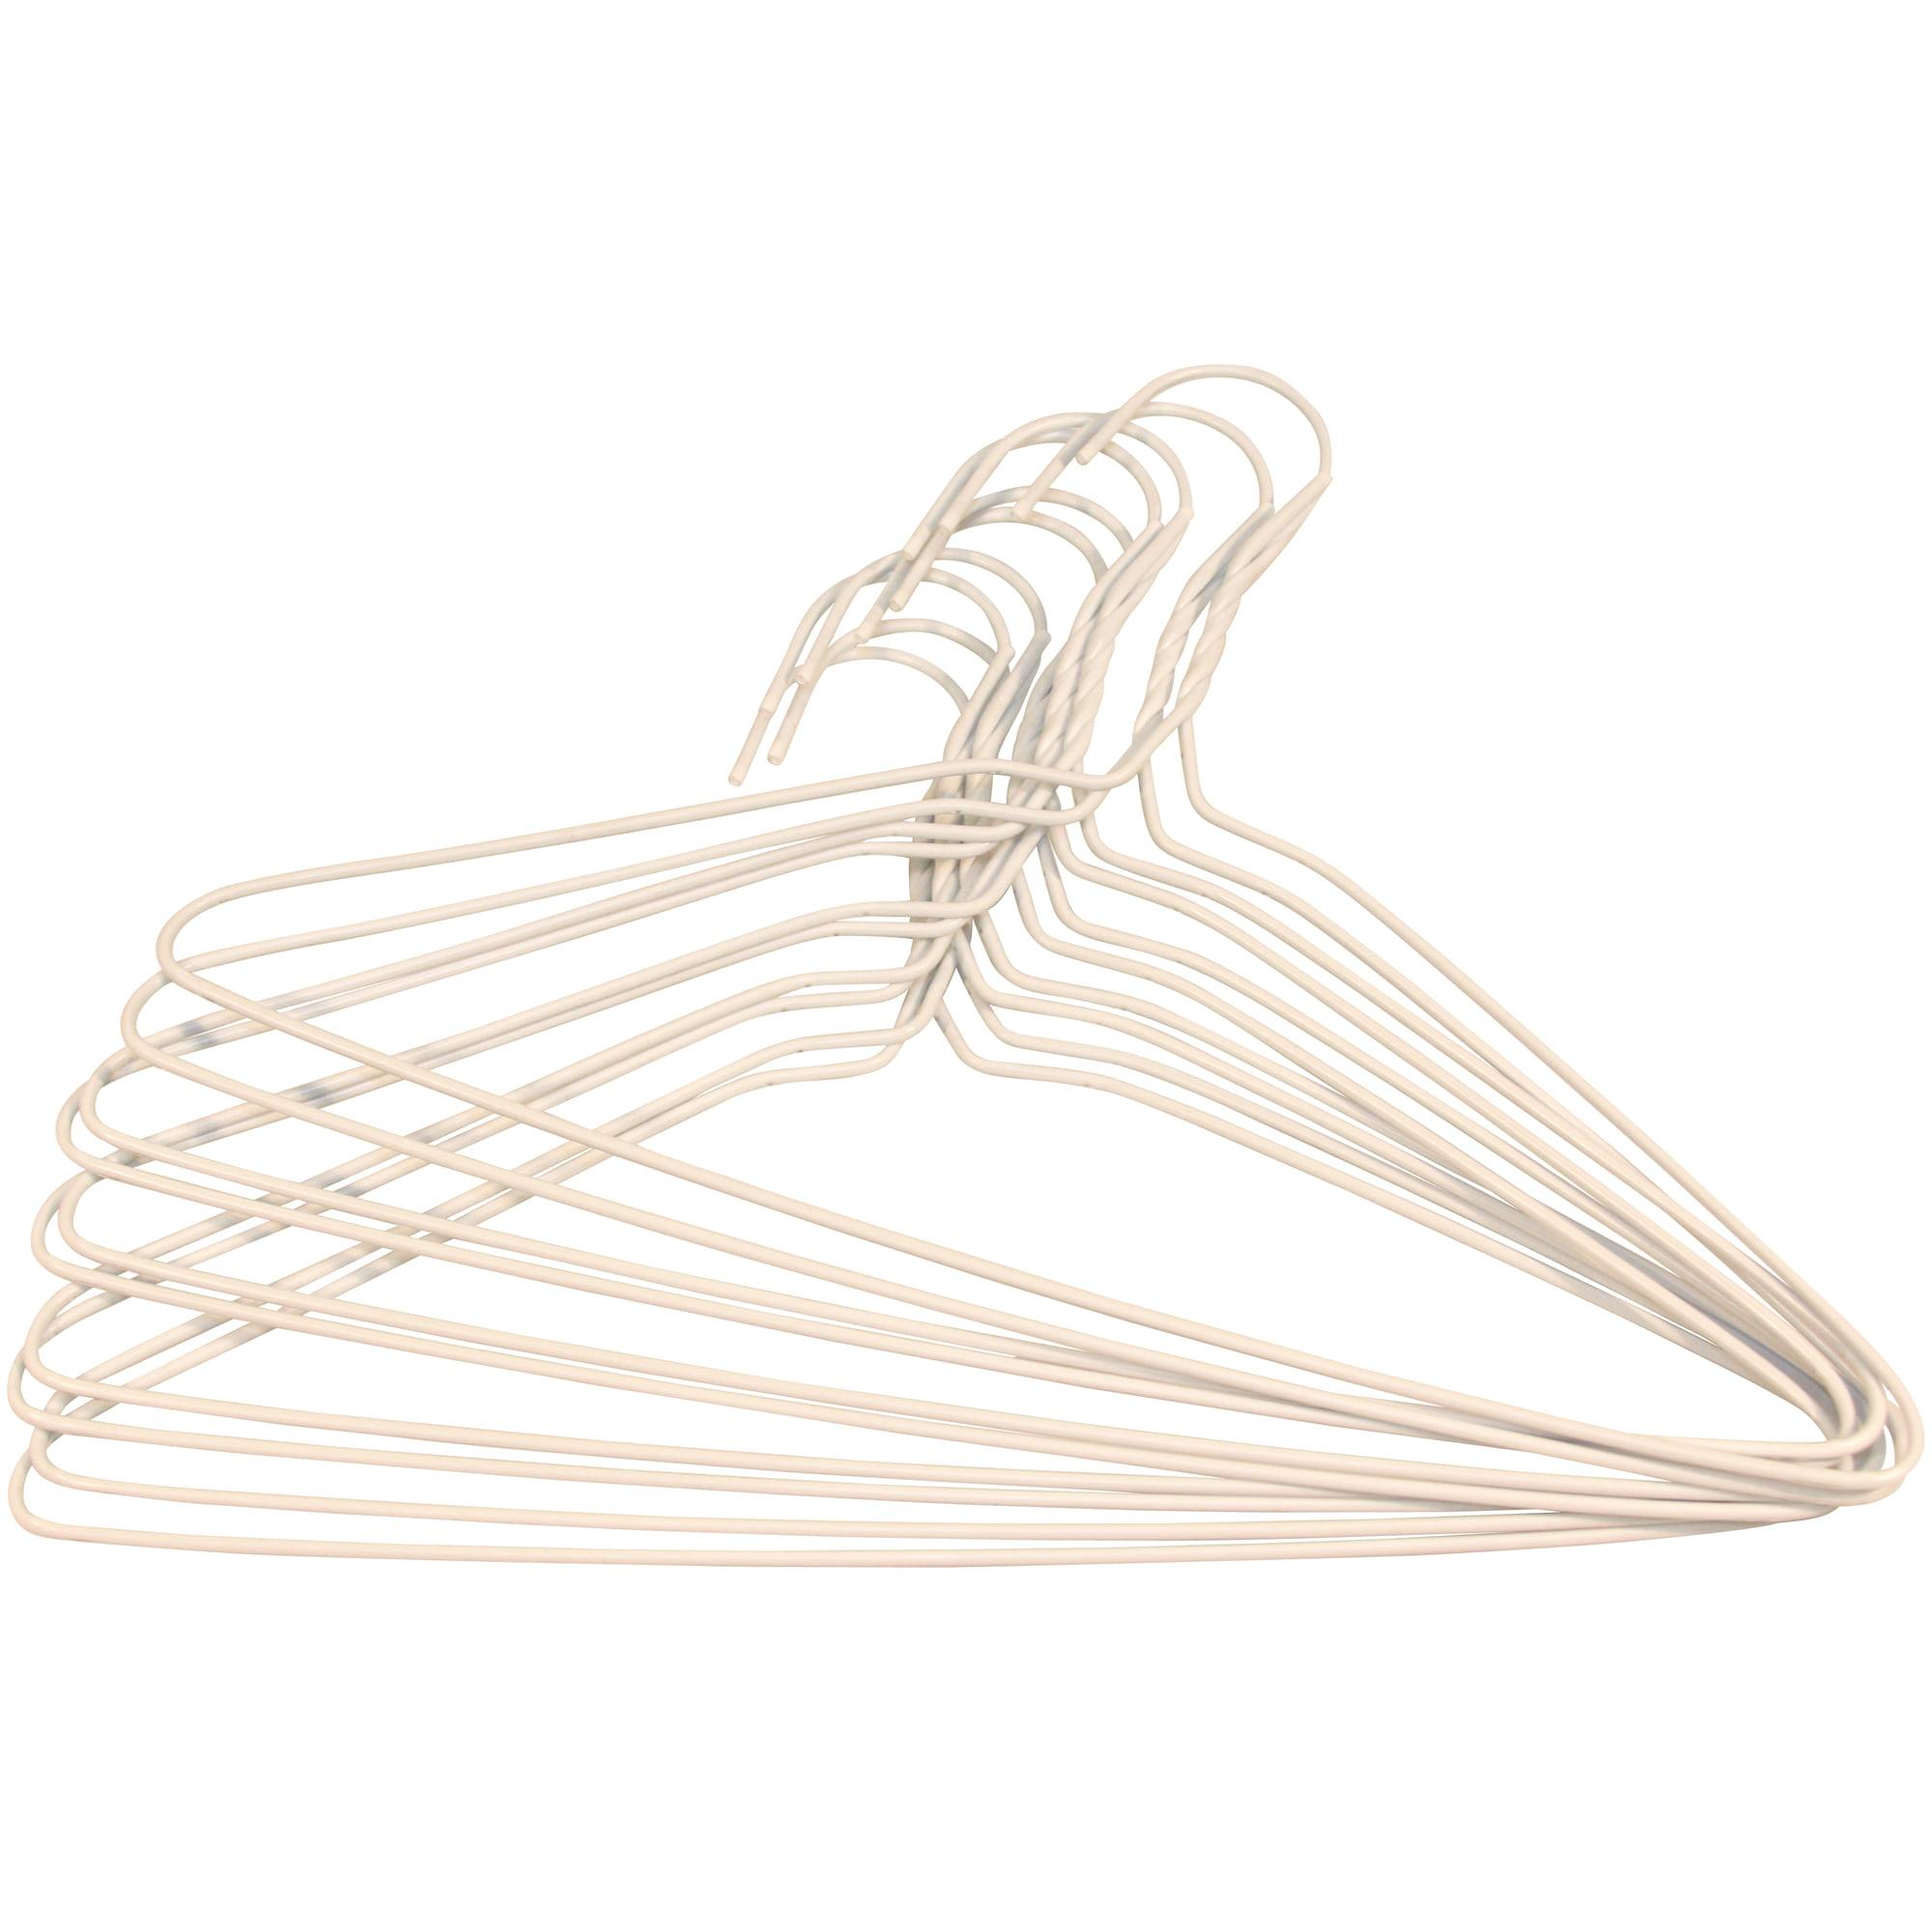 Mainstays Wire Hangers 10pk White Walmart Com